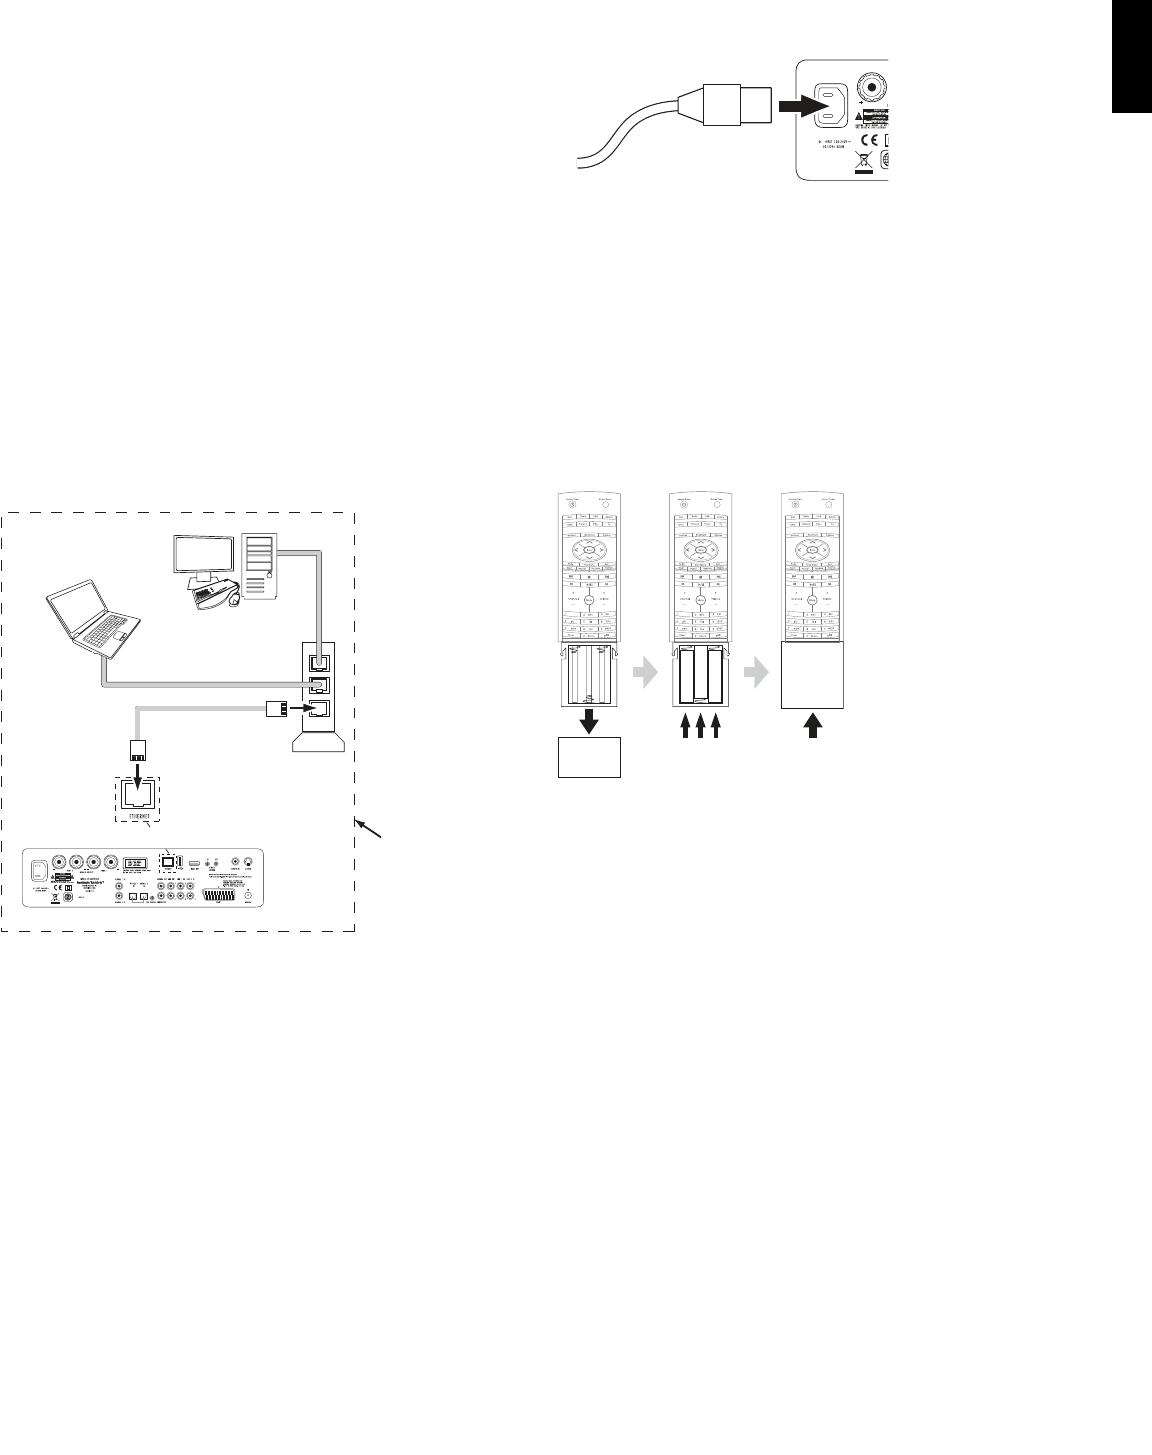 Hs 210 Harman Kardon.Handleiding Harman Kardon Hs 210 Pagina 16 Van 30 English